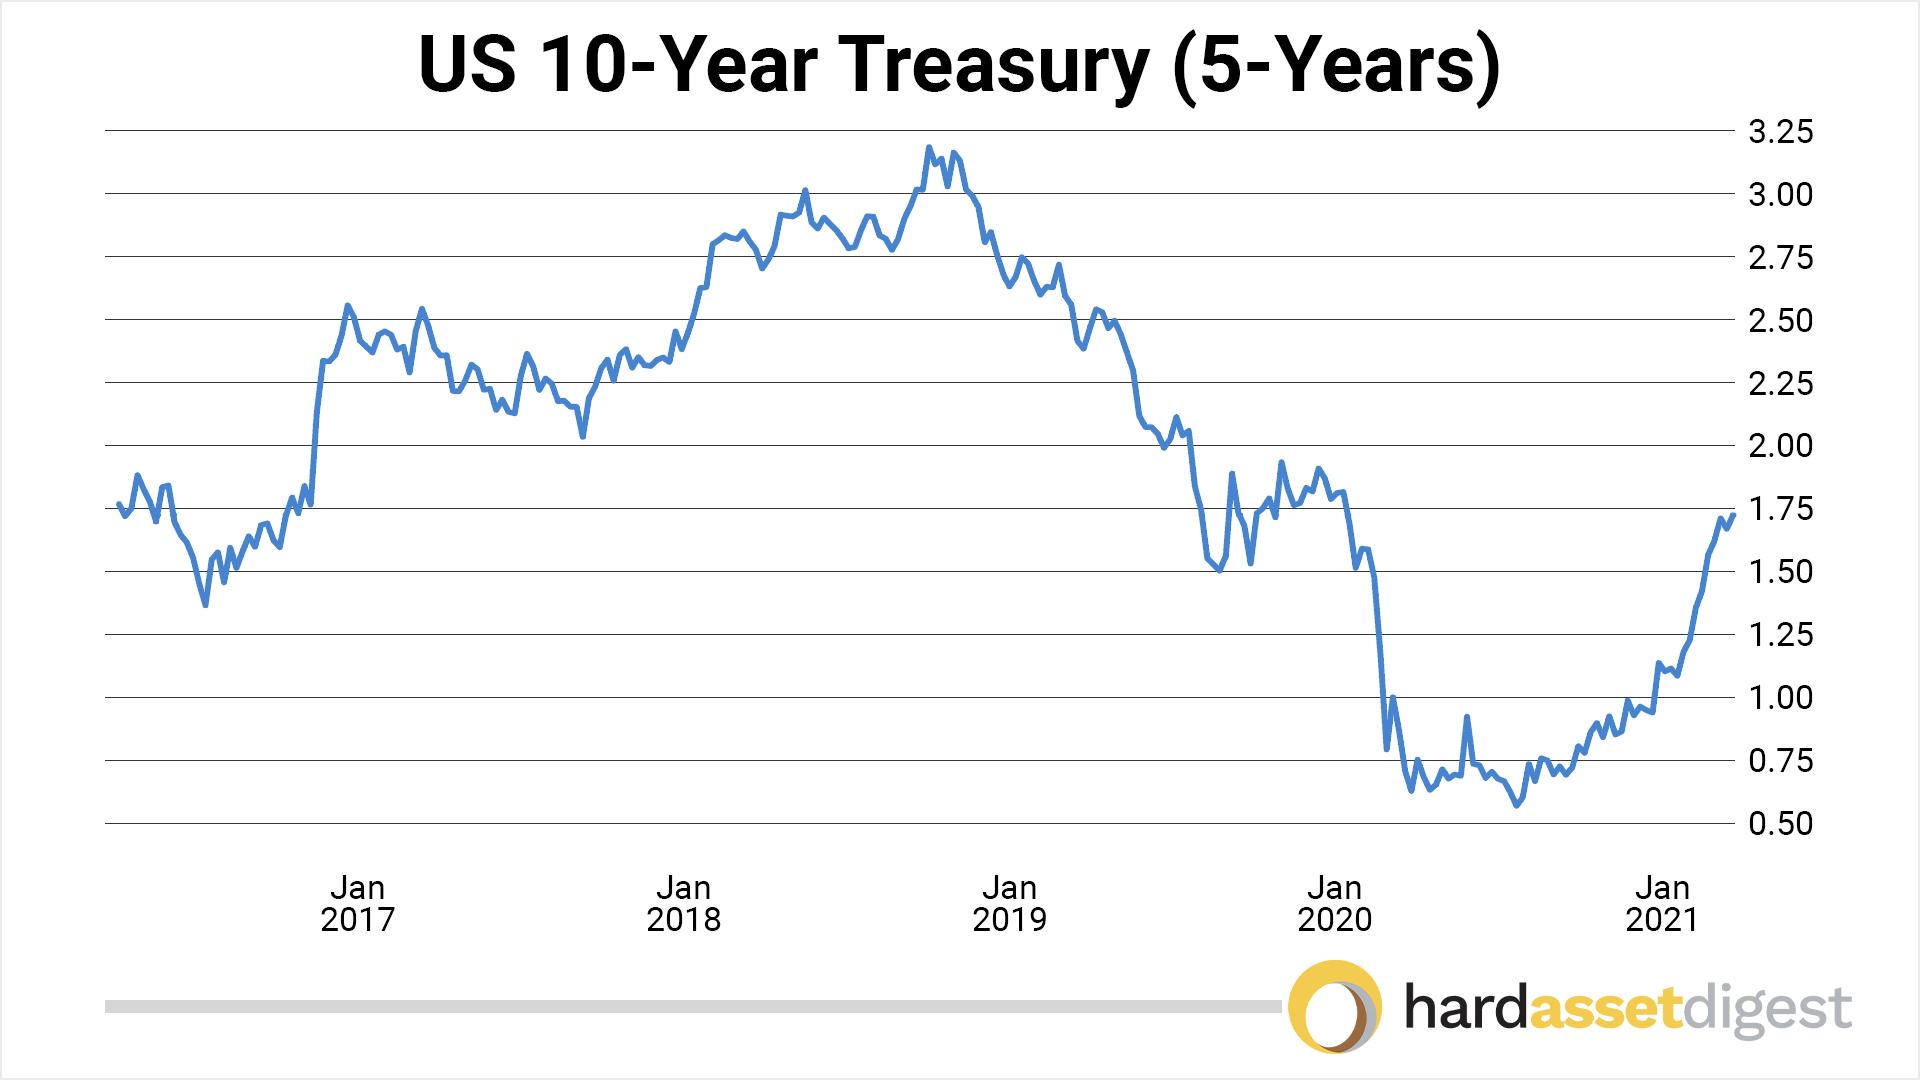 chart-10-year-us-treasury-5-year